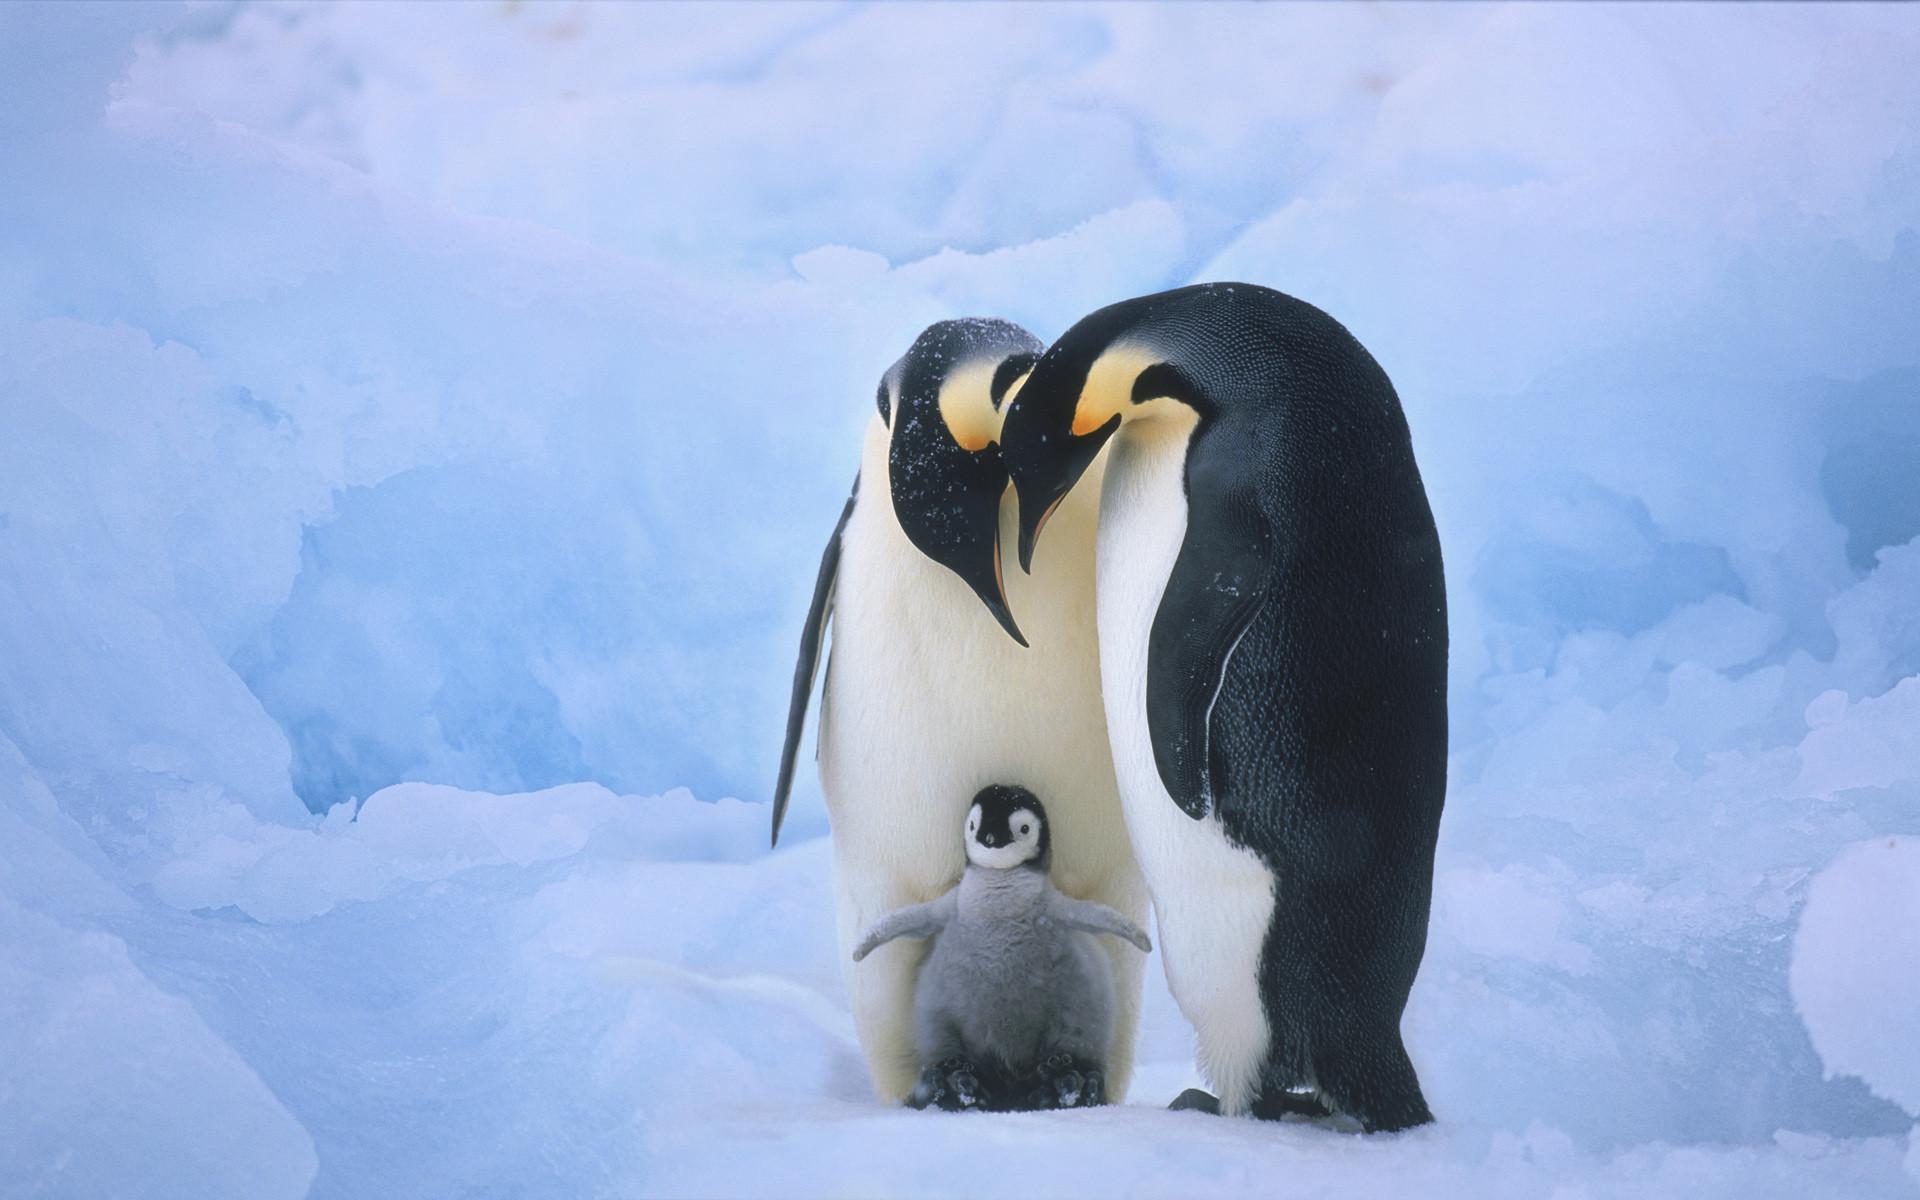 Cute Penguin wallpaper mobile